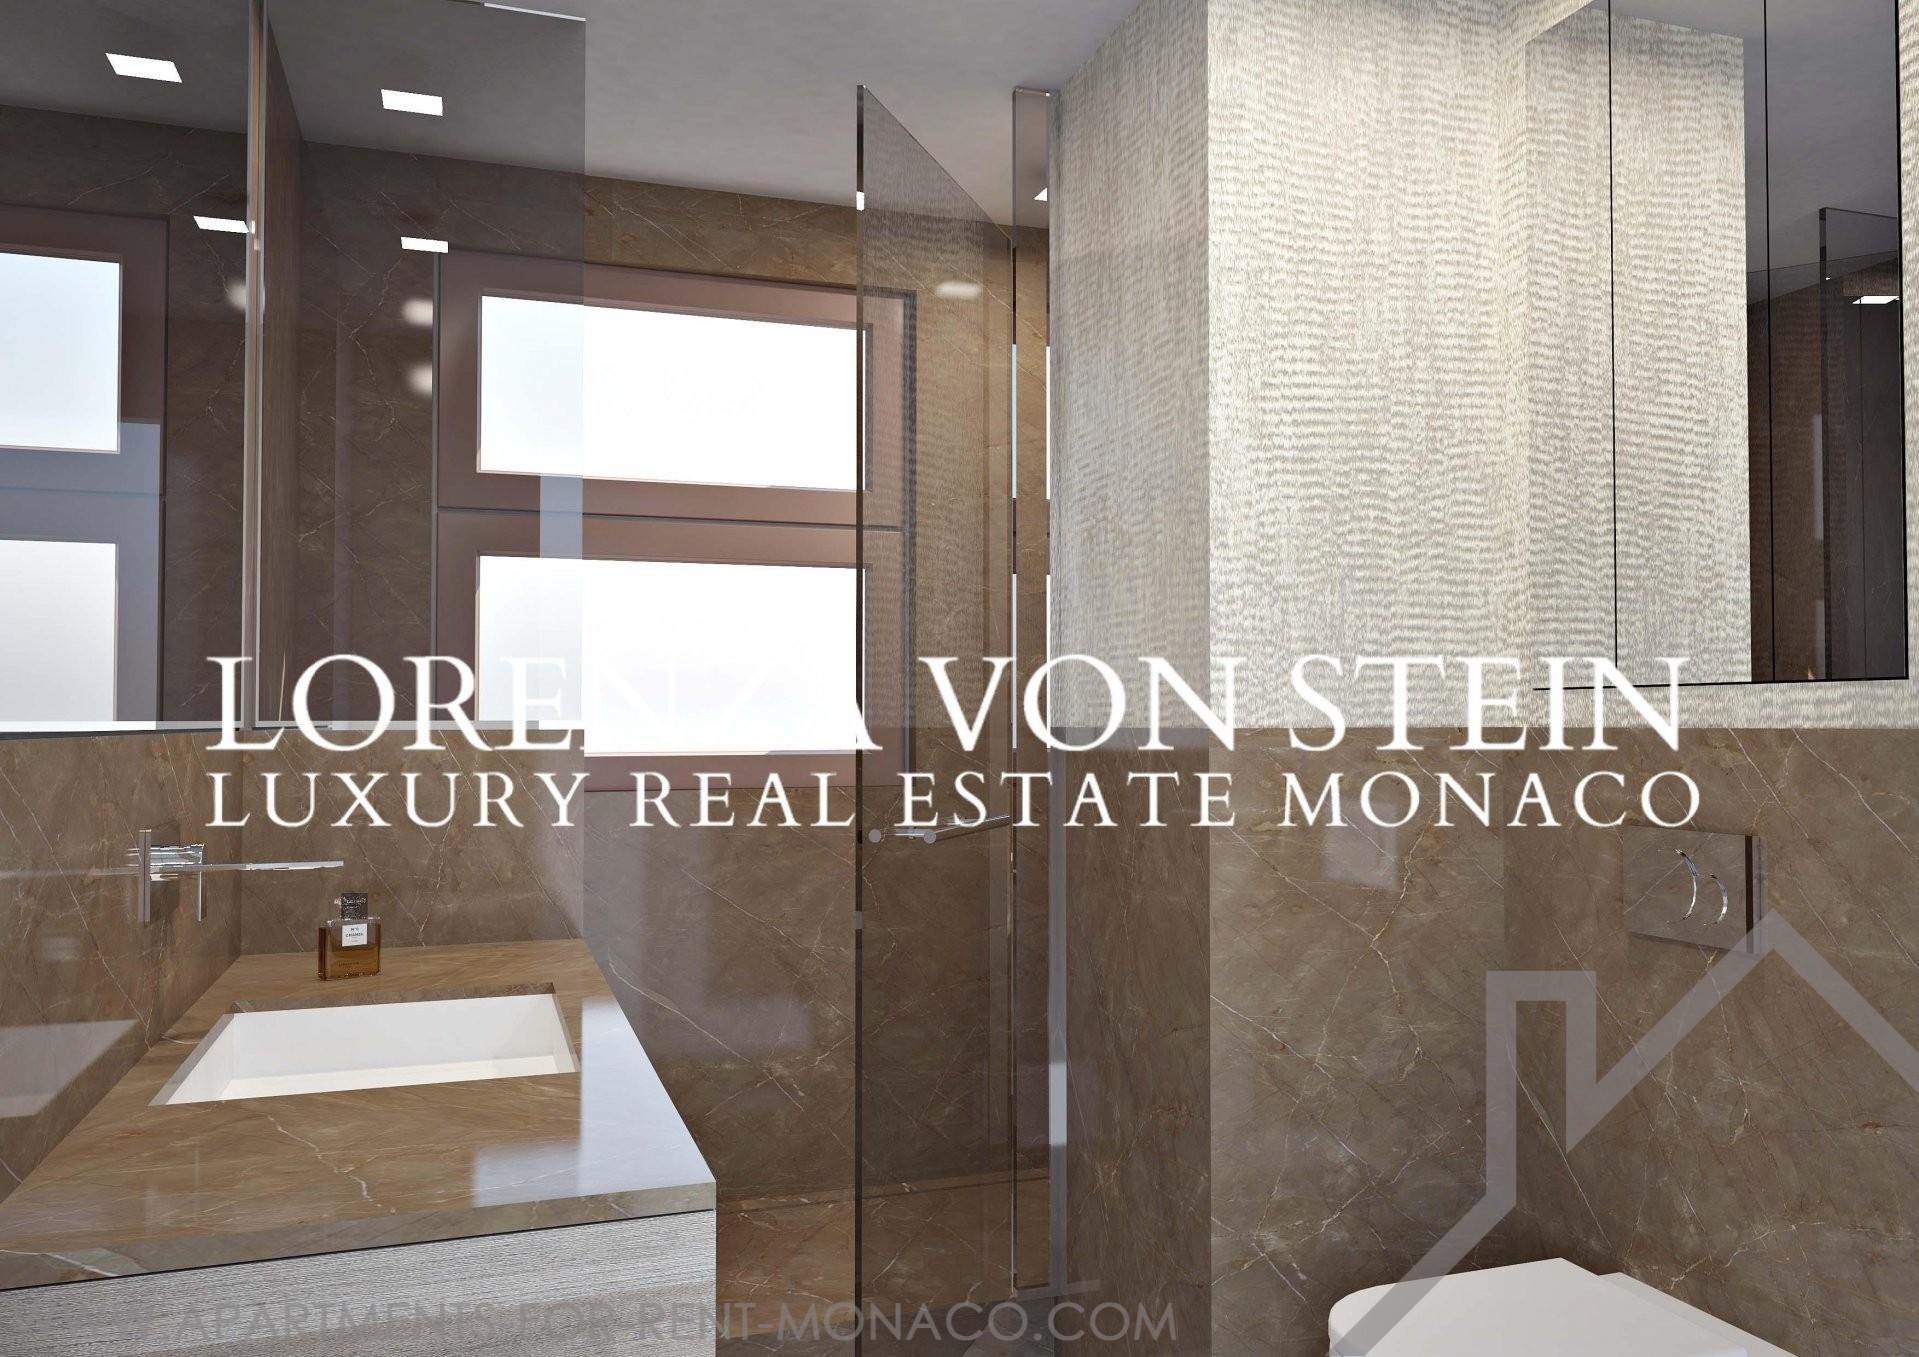 Exclusivit riviera palace lou meubl location d for Location d appartement meuble